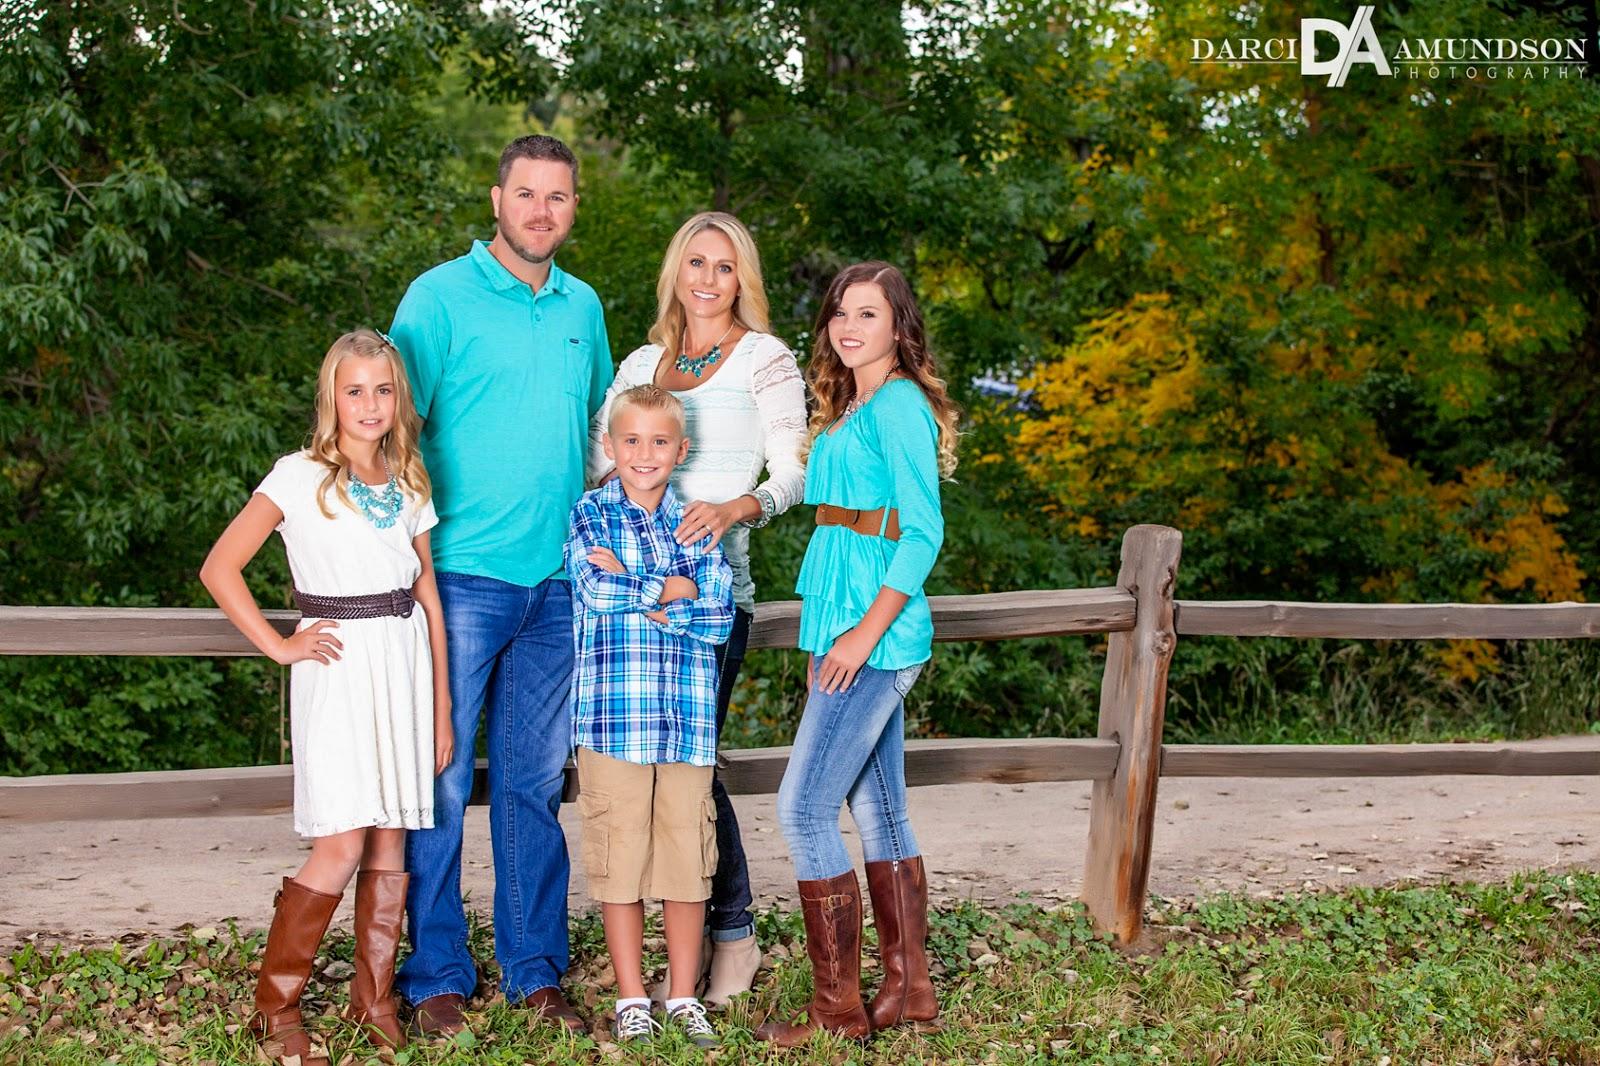 Rohr Family  Denver Fall Family Photographer  Darci Amundson Photography